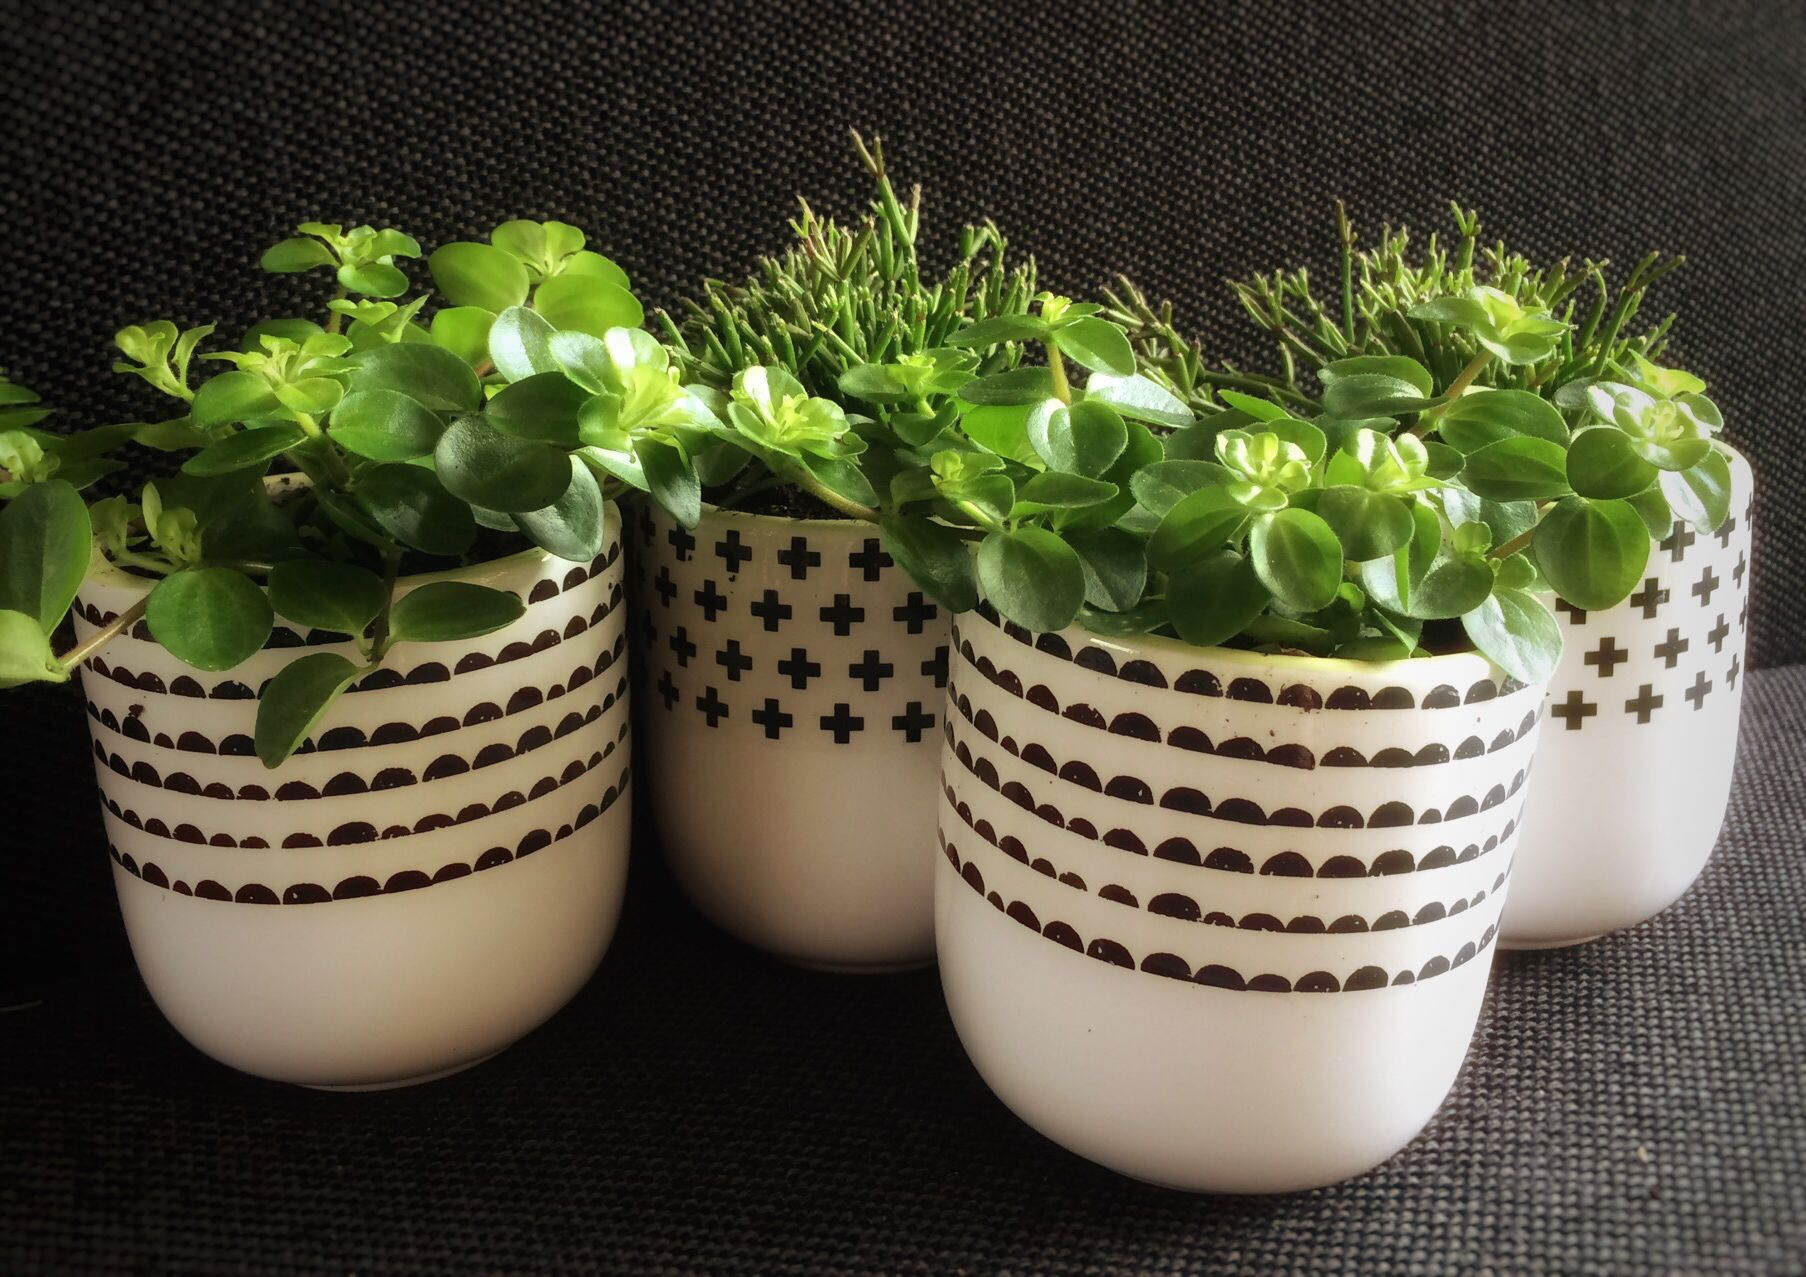 Planten woonkamerplanten bloempotten van Xenos ferm living zwart wit